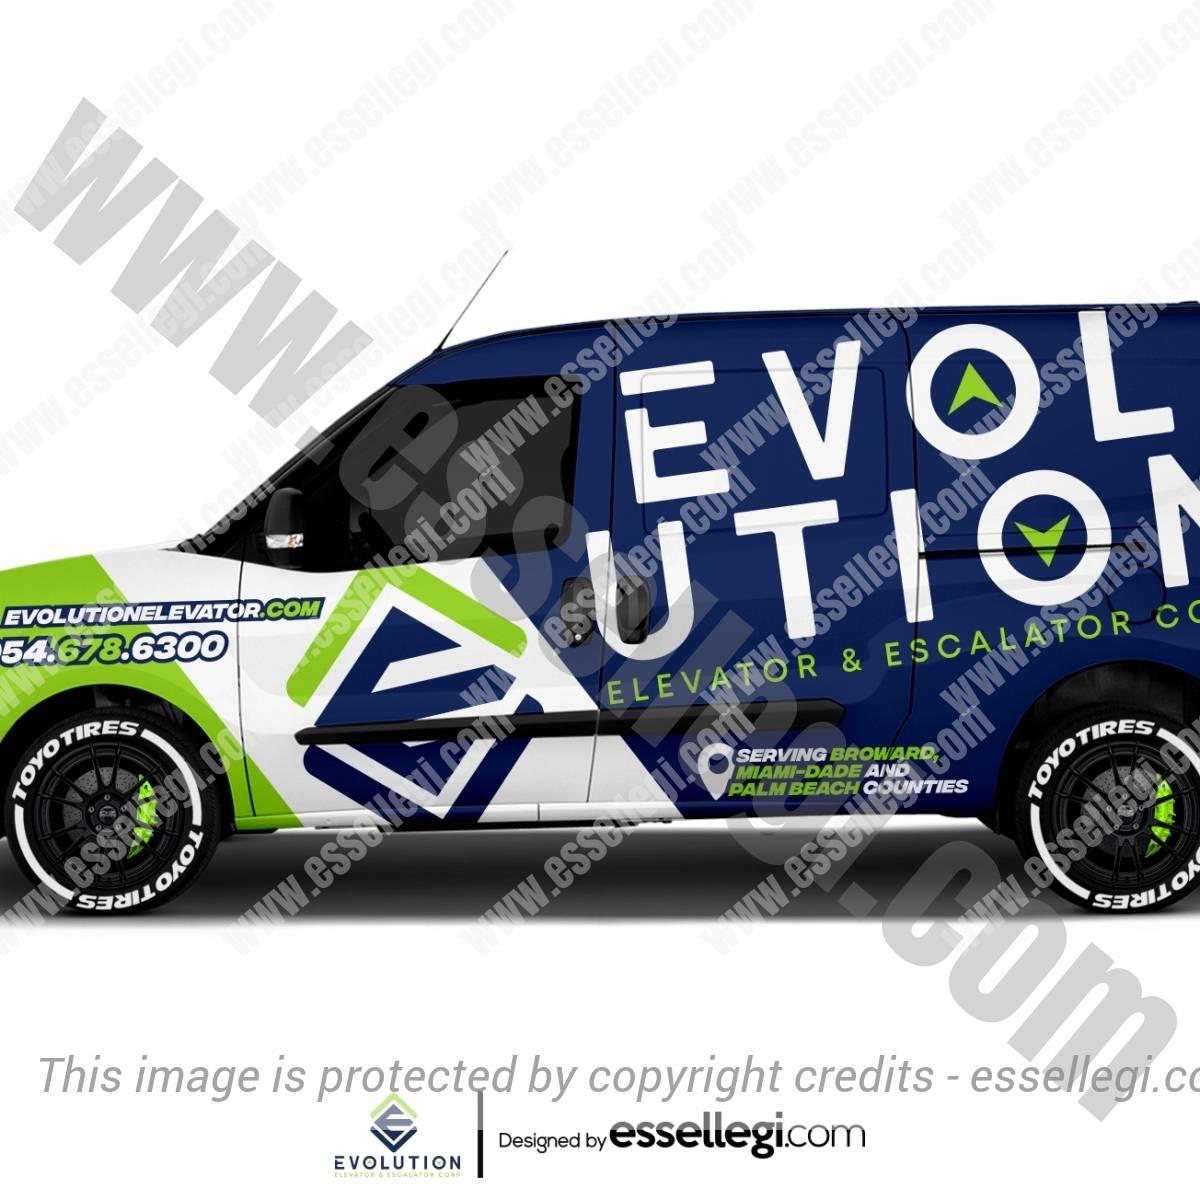 EVOLUTION ELEVATOR | VAN WRAP DESIGN 🇺🇸